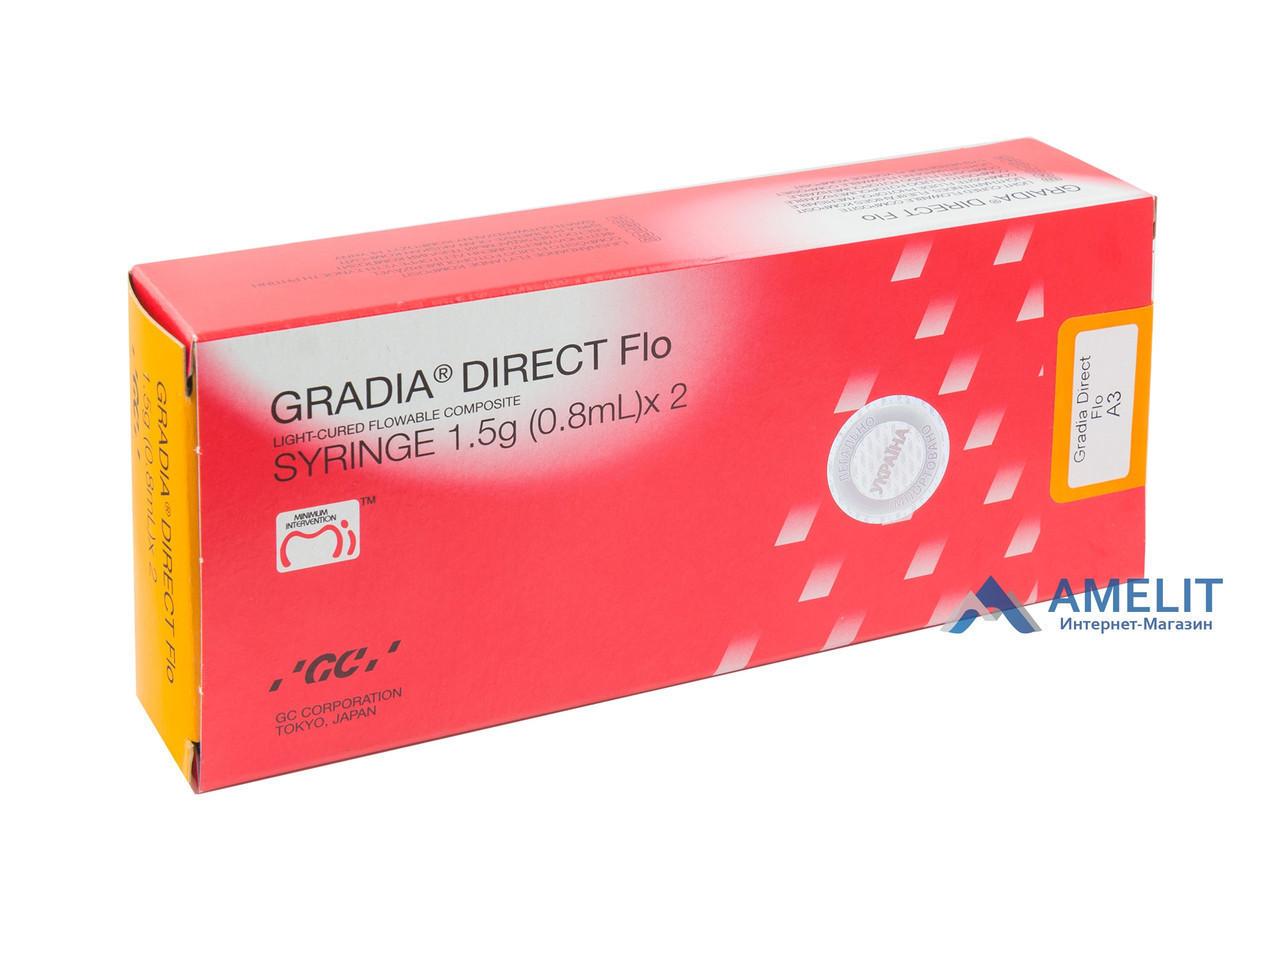 Градиа Дайрект Флоу BW (Gradia Direct Flo, GC), шприц 1,5г